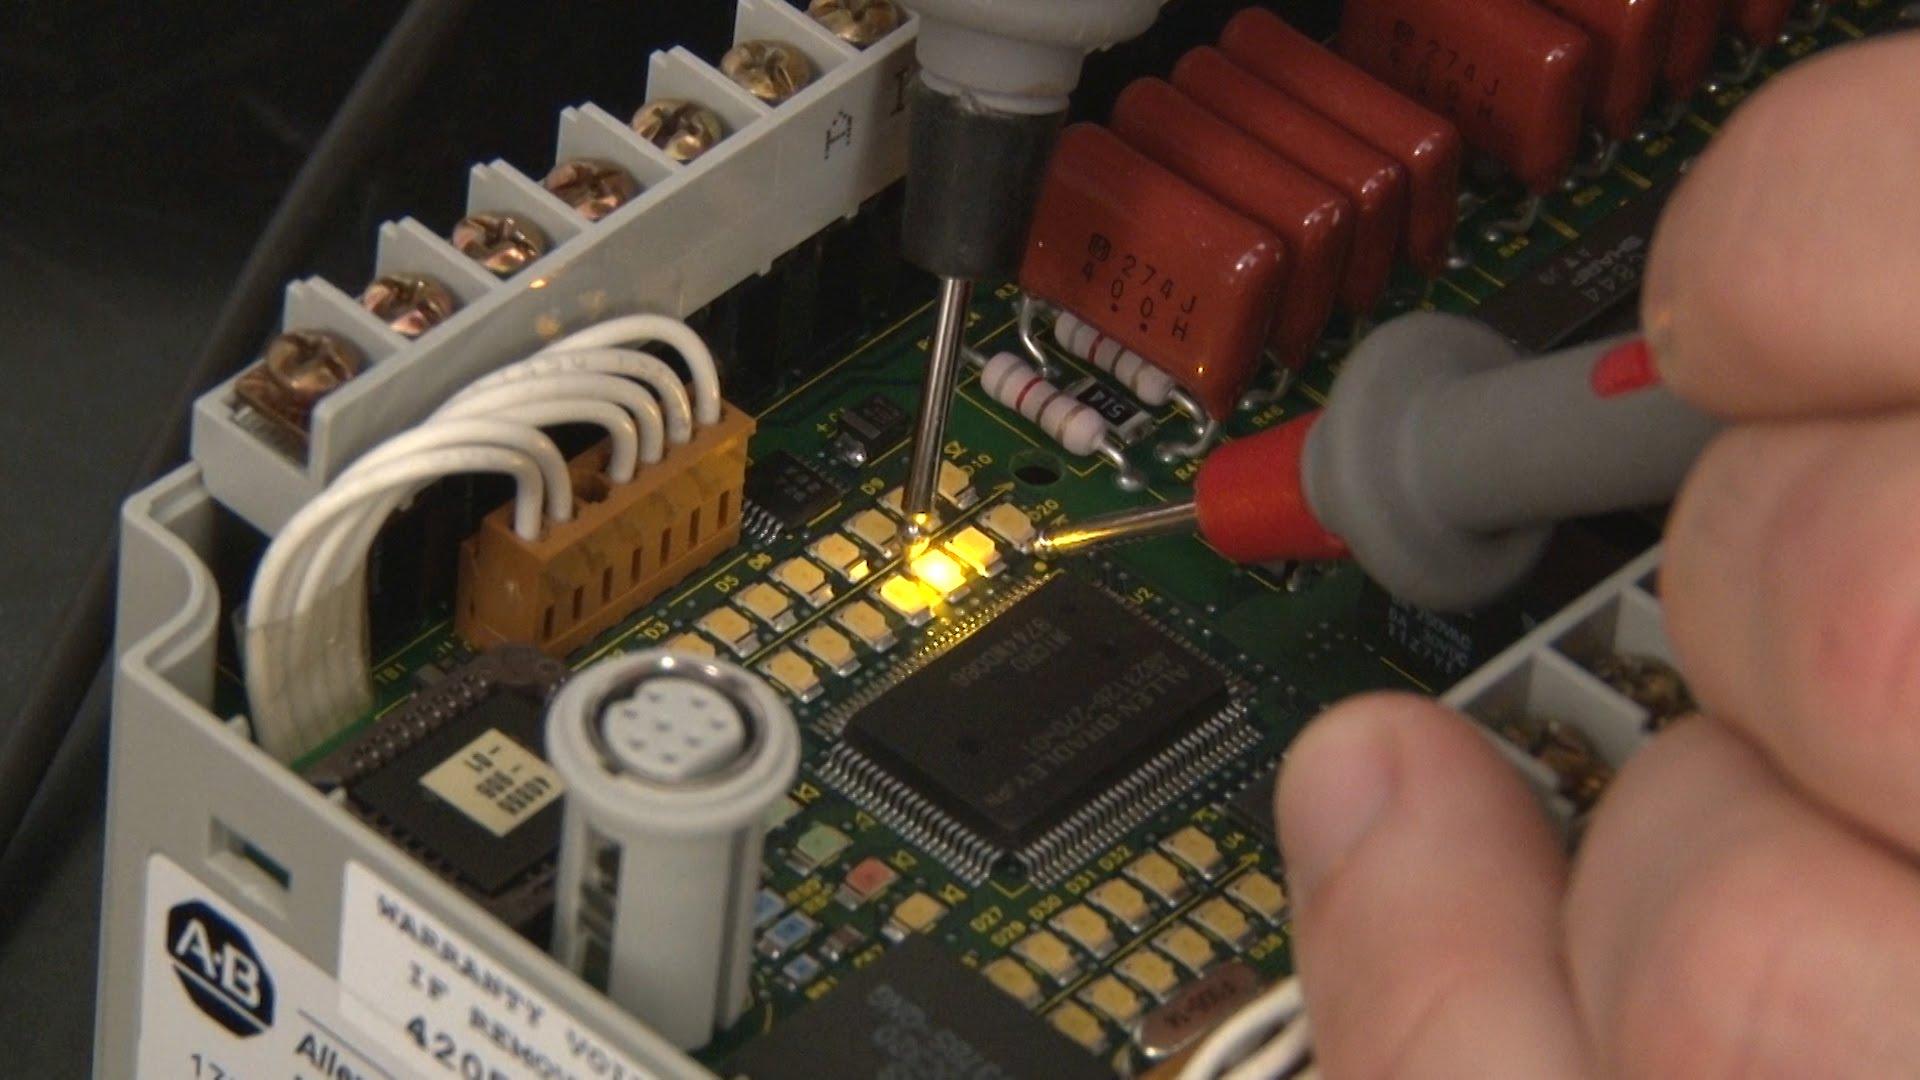 Vfd Acdc Service Center Mobile No8885448877 By Digital Inverter Welding Pcb Board Cutting Machine Circuit Industry Electronics Repairing In Guntur Tirupathi